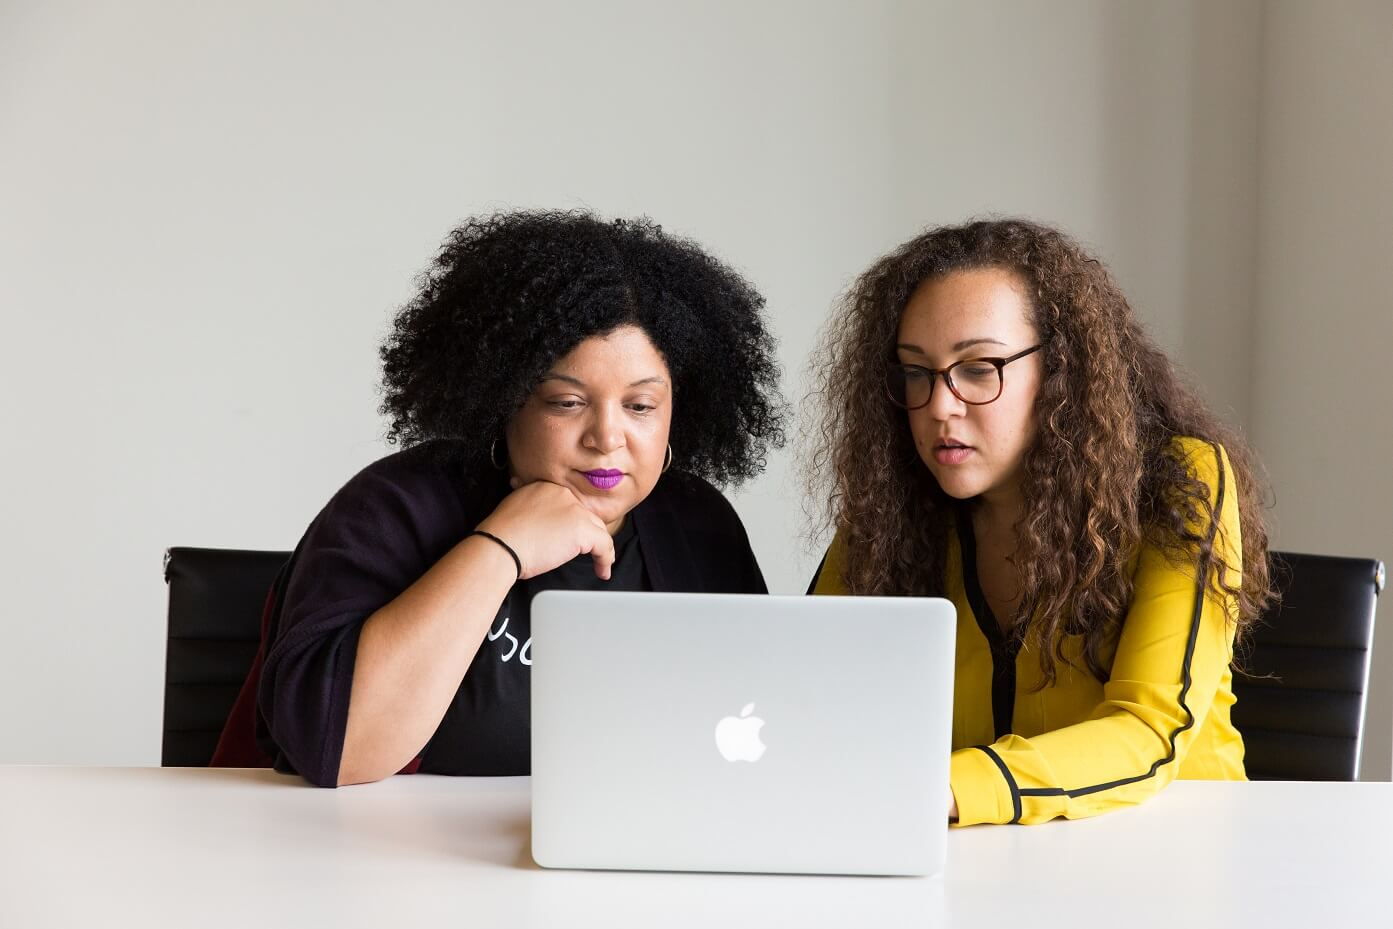 Two women using a laptop.